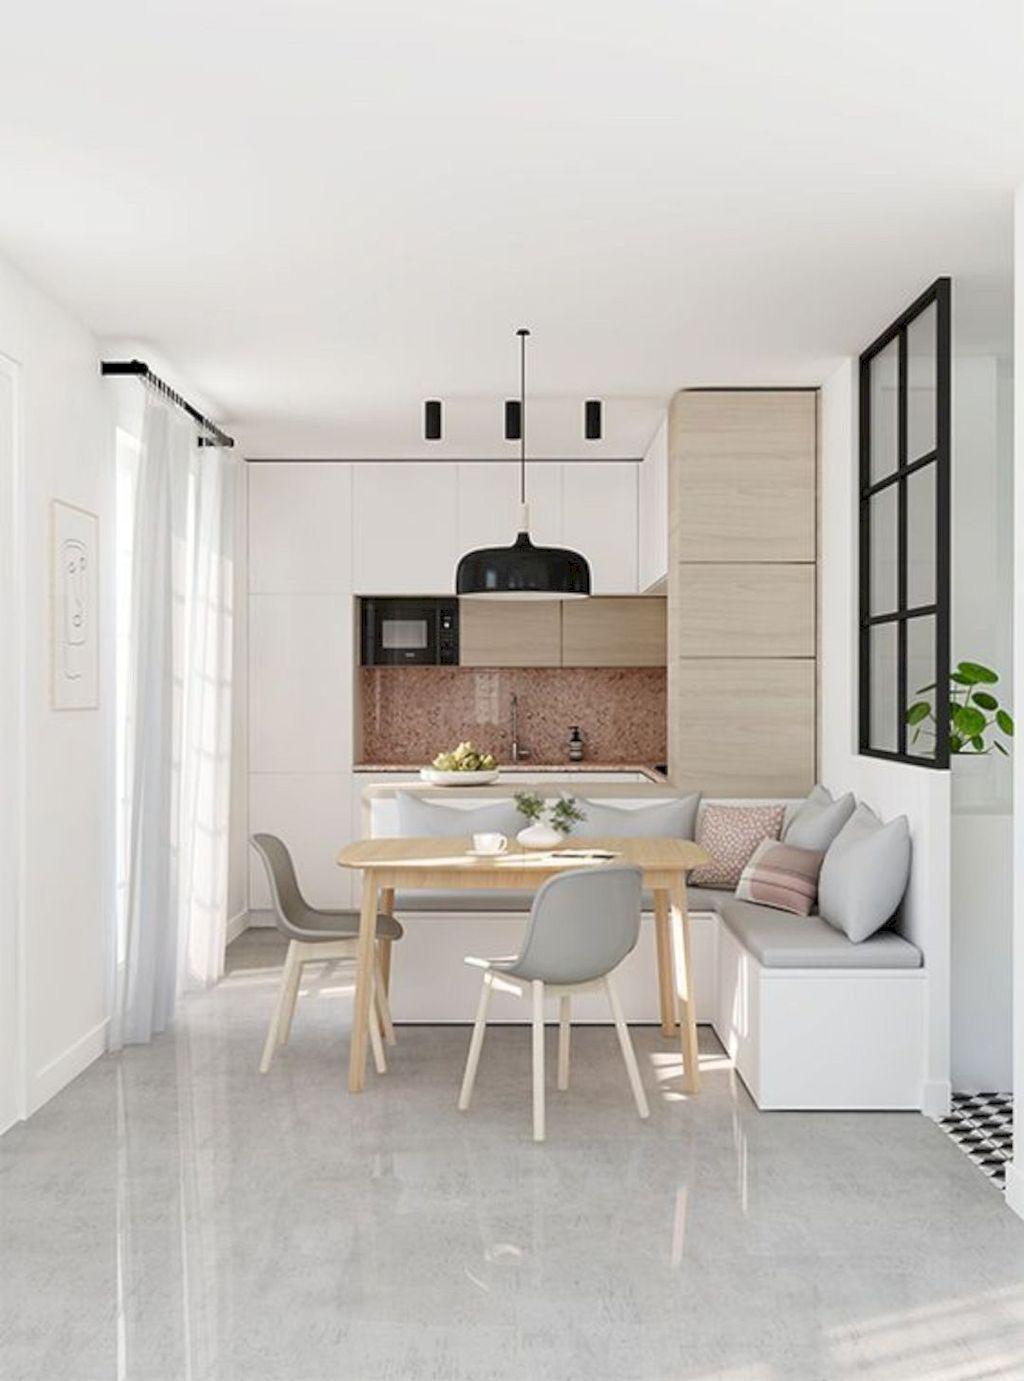 The Best Of Little Apartment Kitchen Decor Small Room Design Apartment Design Kitchen Design